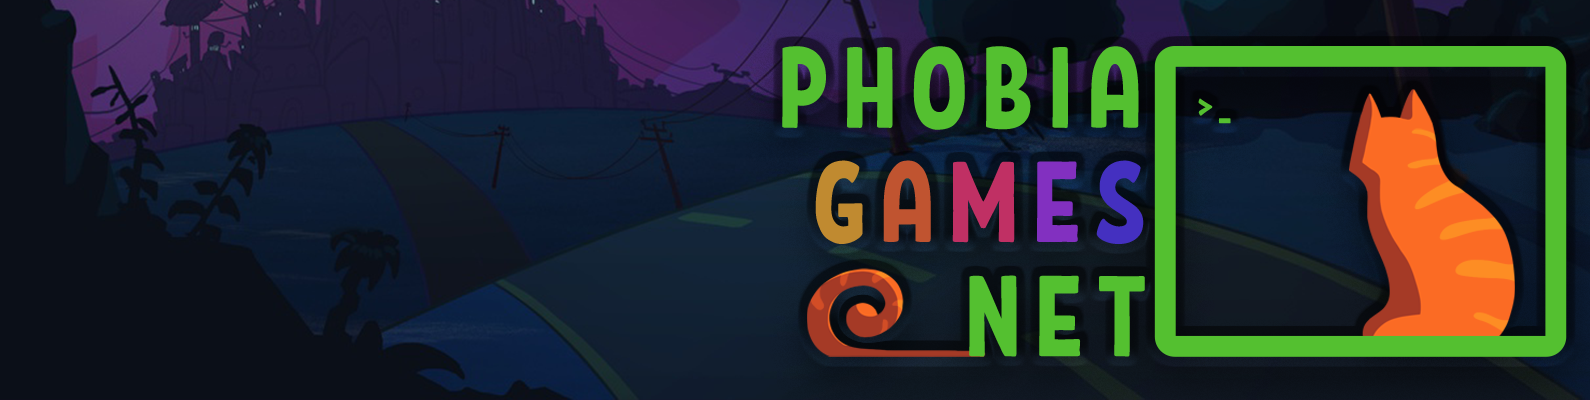 PhobiaGamesNet